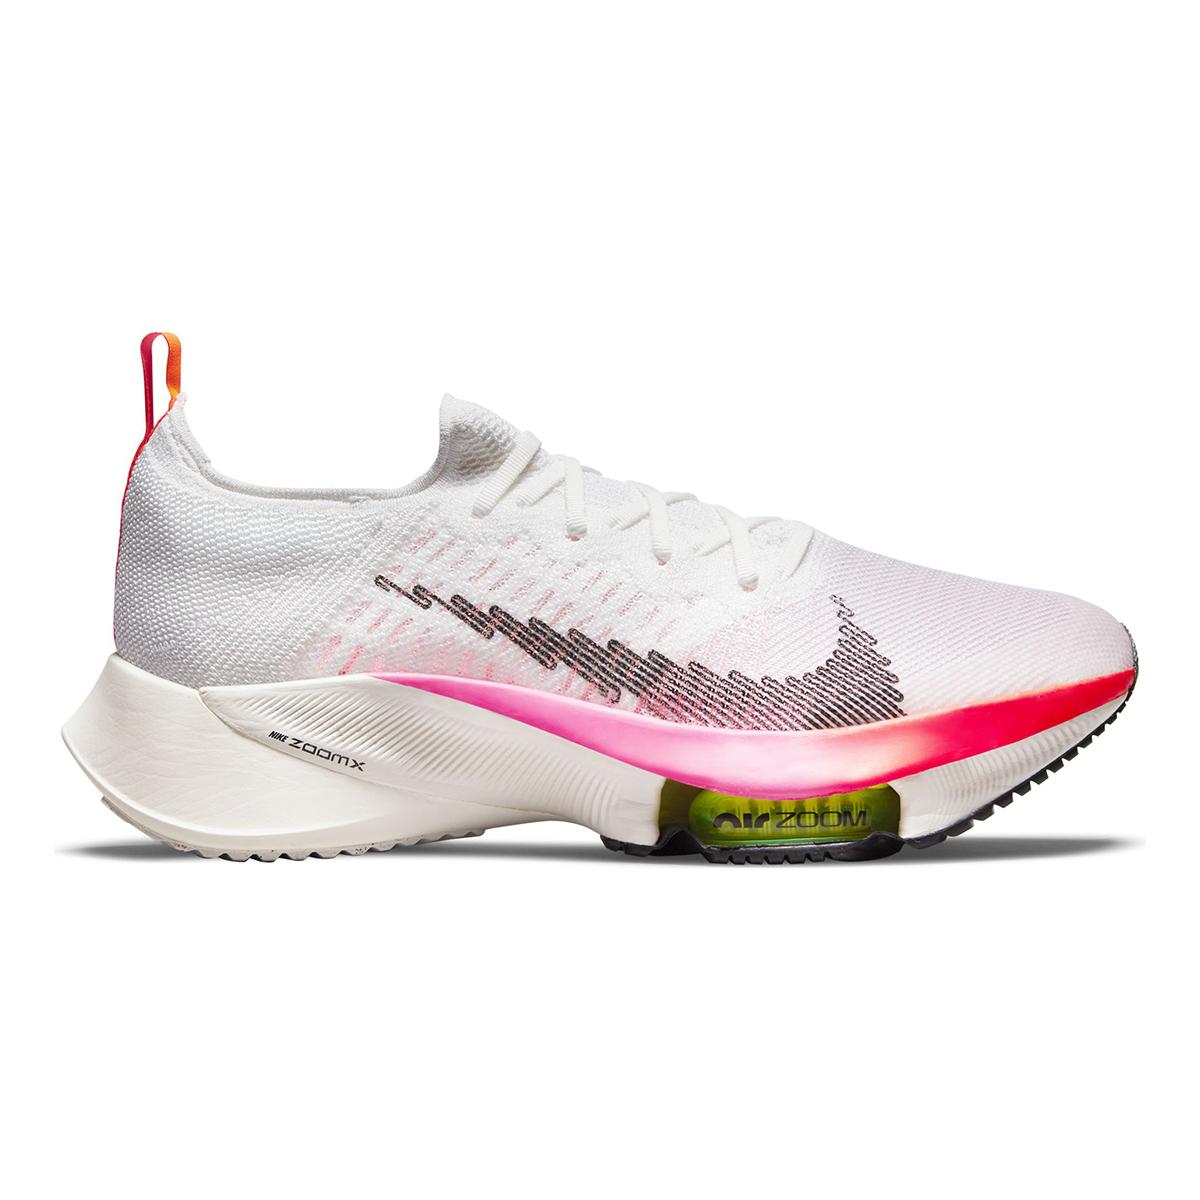 Men's Nike Air Zoom Tempo Next% Flyknit Running Shoe - Color: Rawdacious - Size: 6 - Width: Regular, Rawdacious, large, image 1